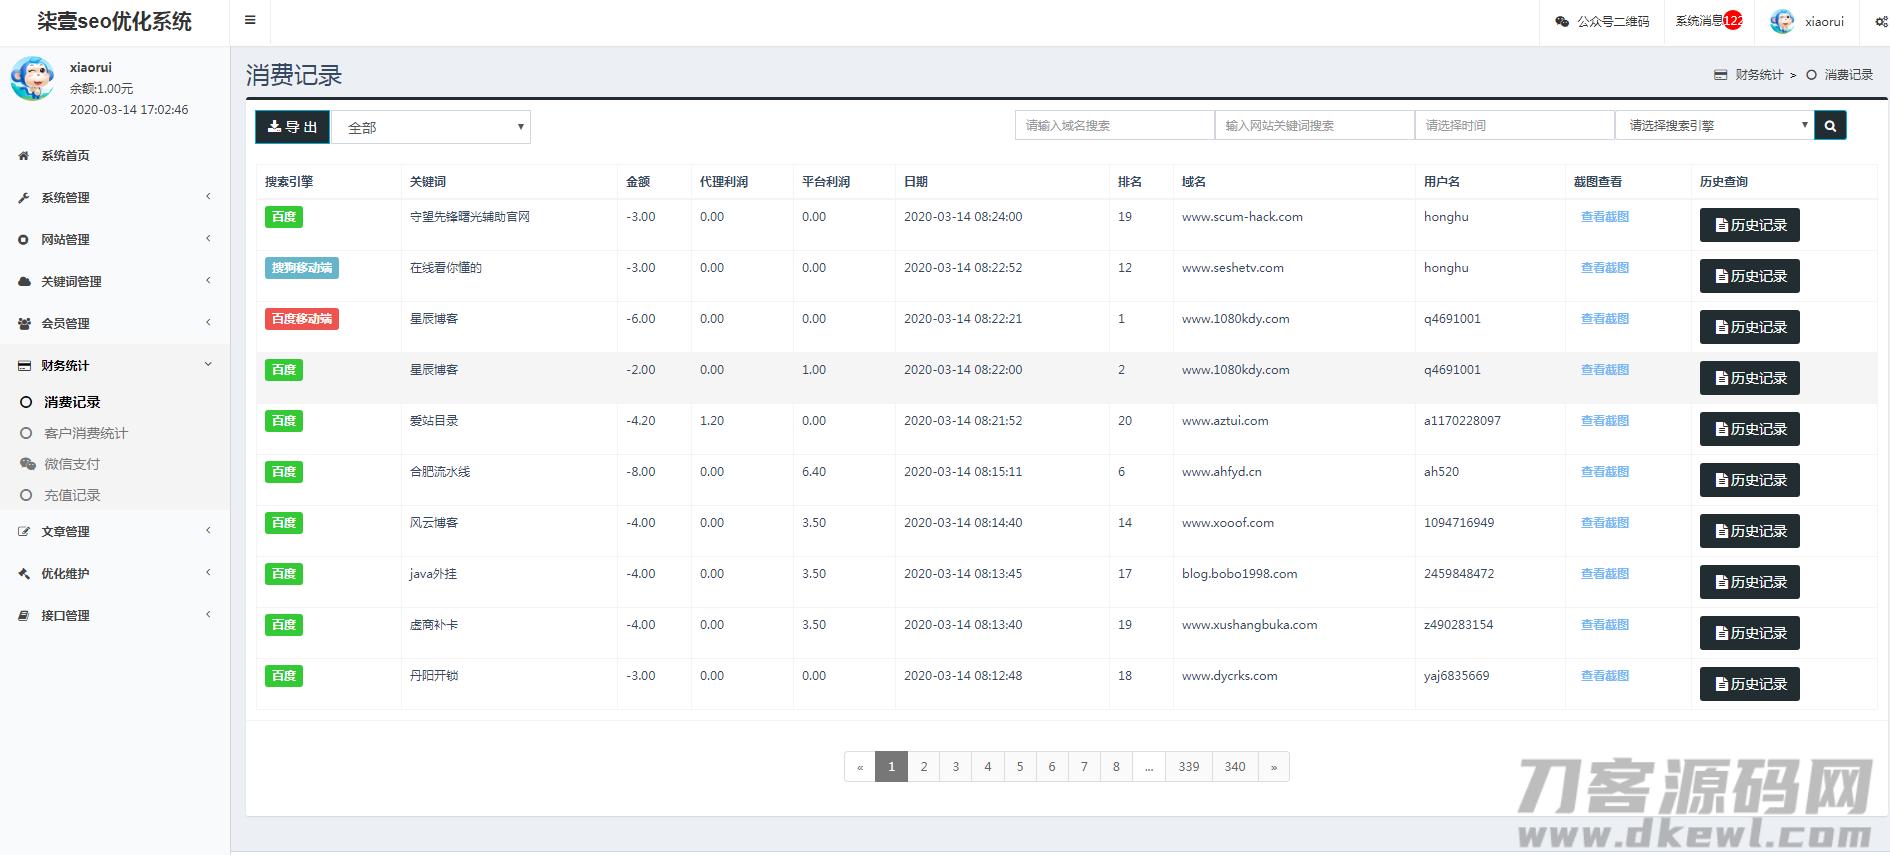 SEO按天扣费系统源代码/SEO计费系统/关键词计费扣费系统/关键词排名查询系统插图4